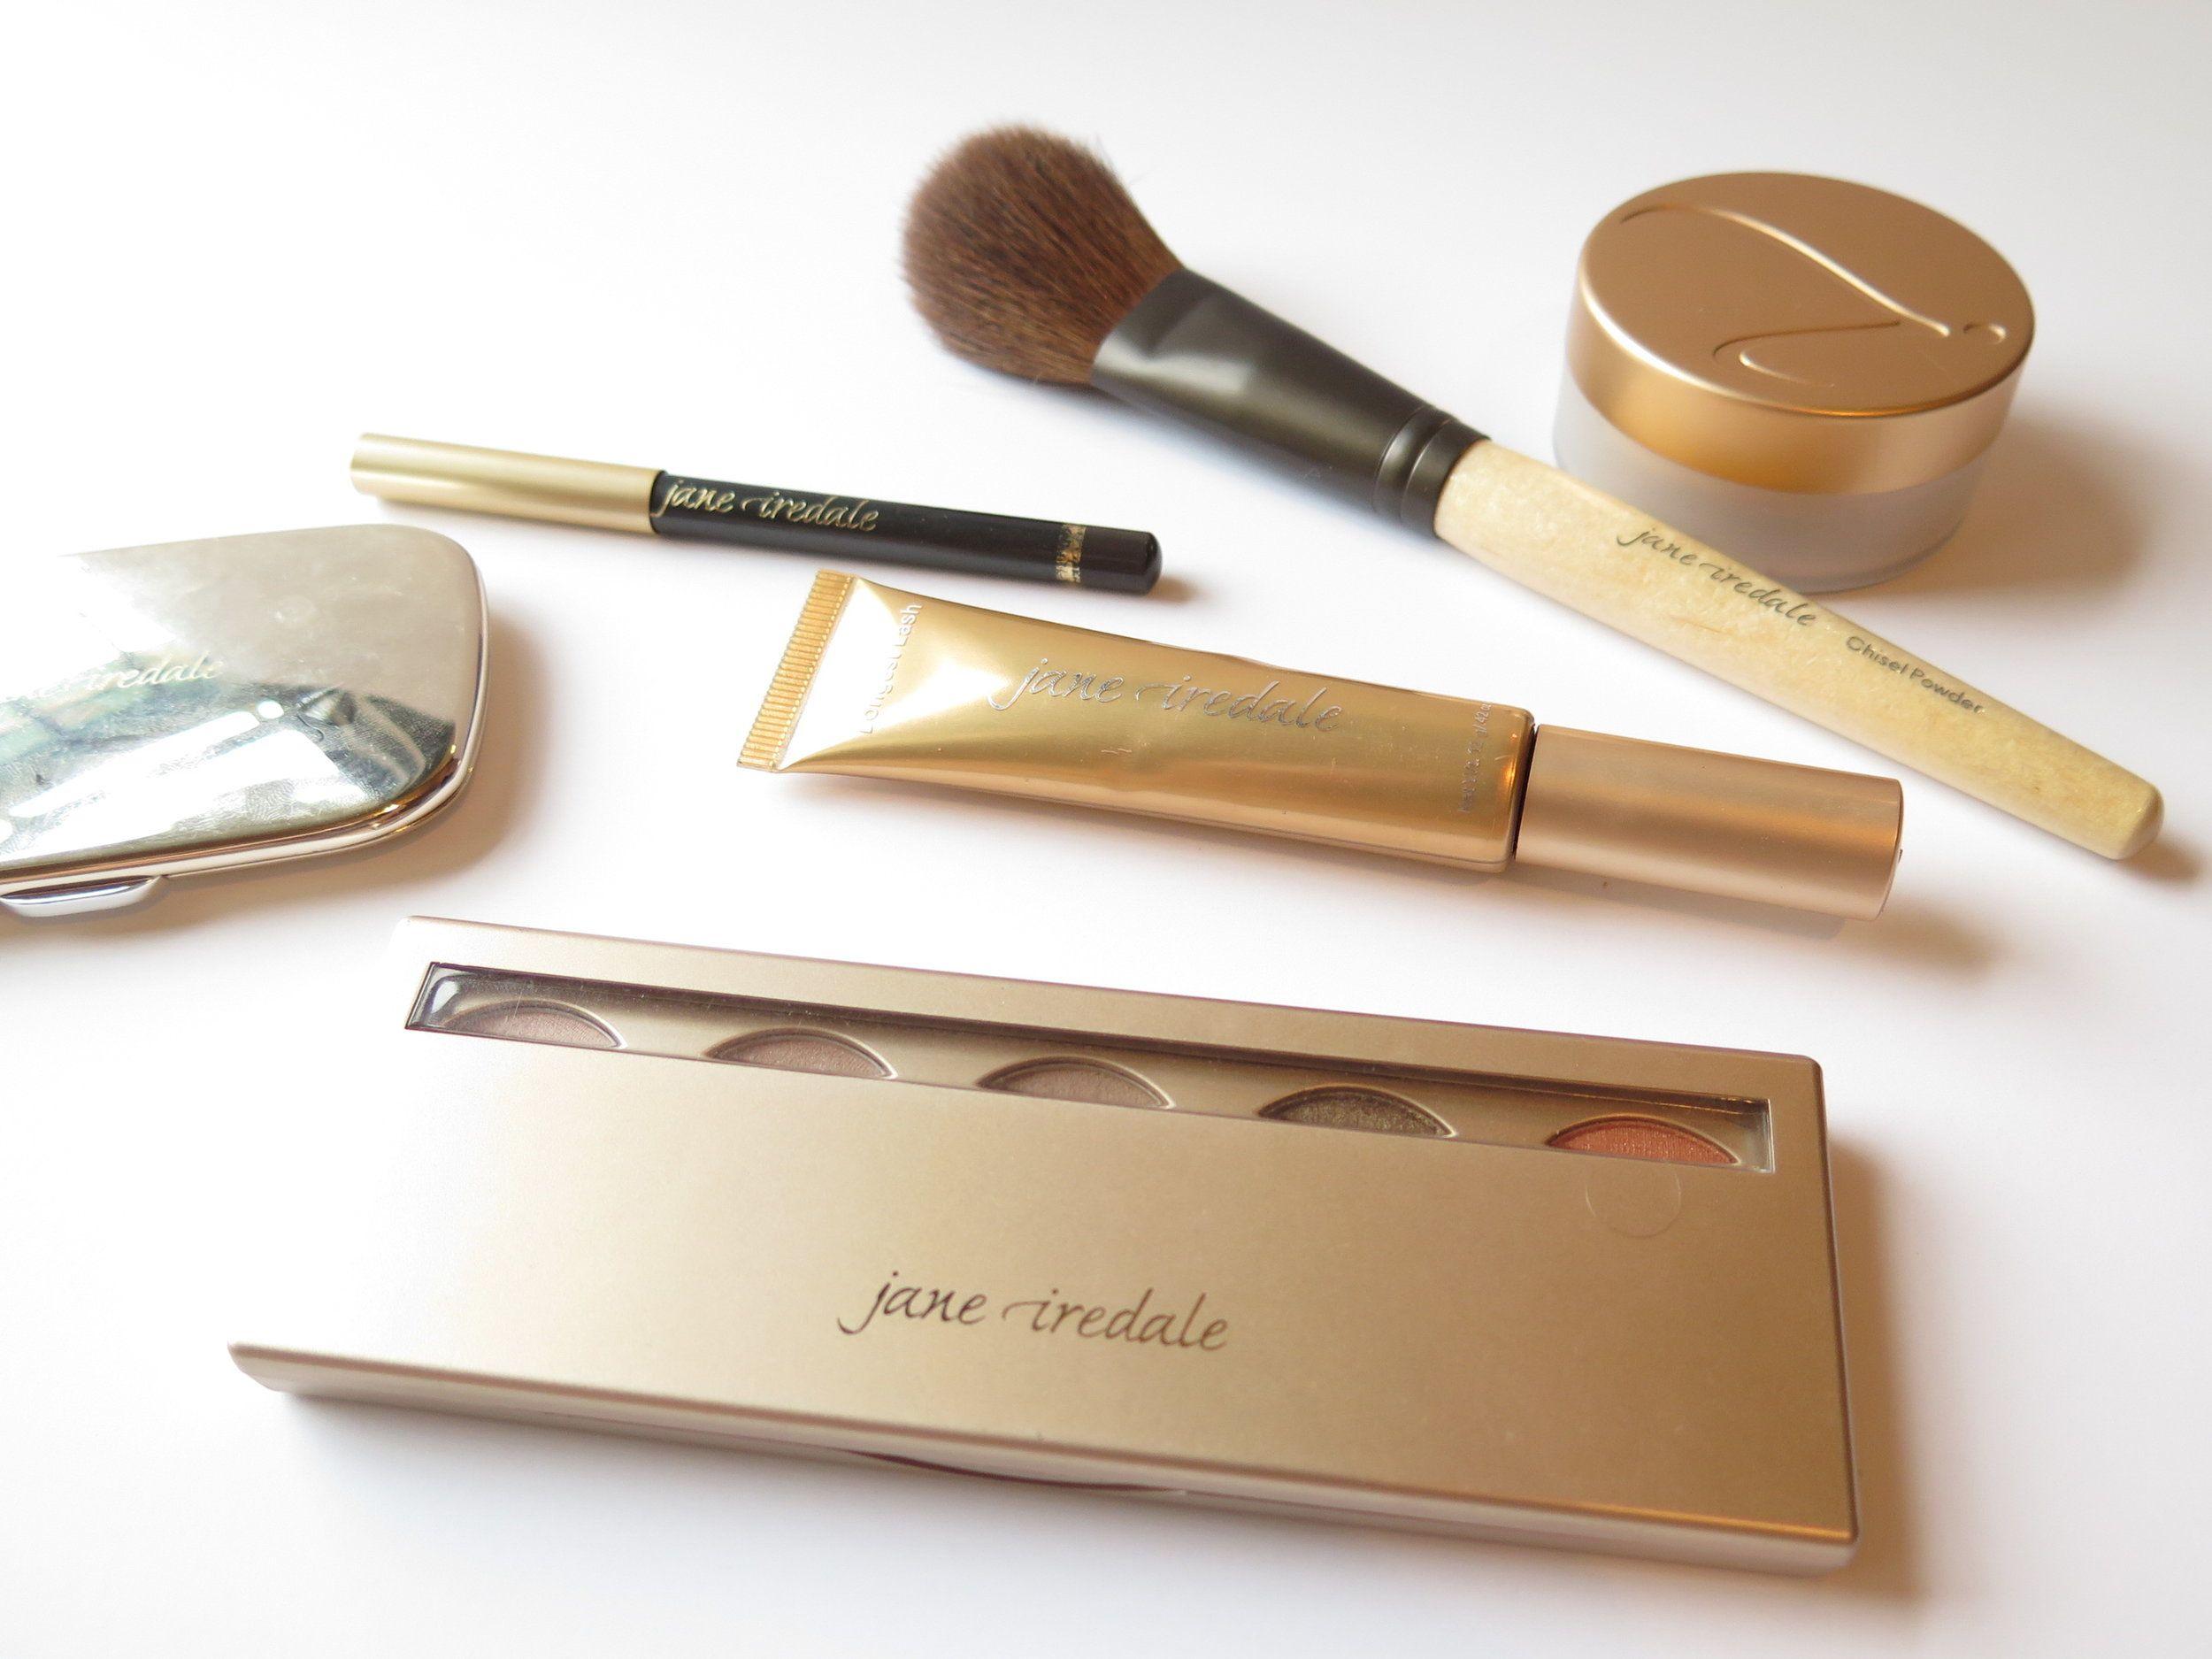 Jane Iredale Makeup Jane iredale makeup, Makeup reviews